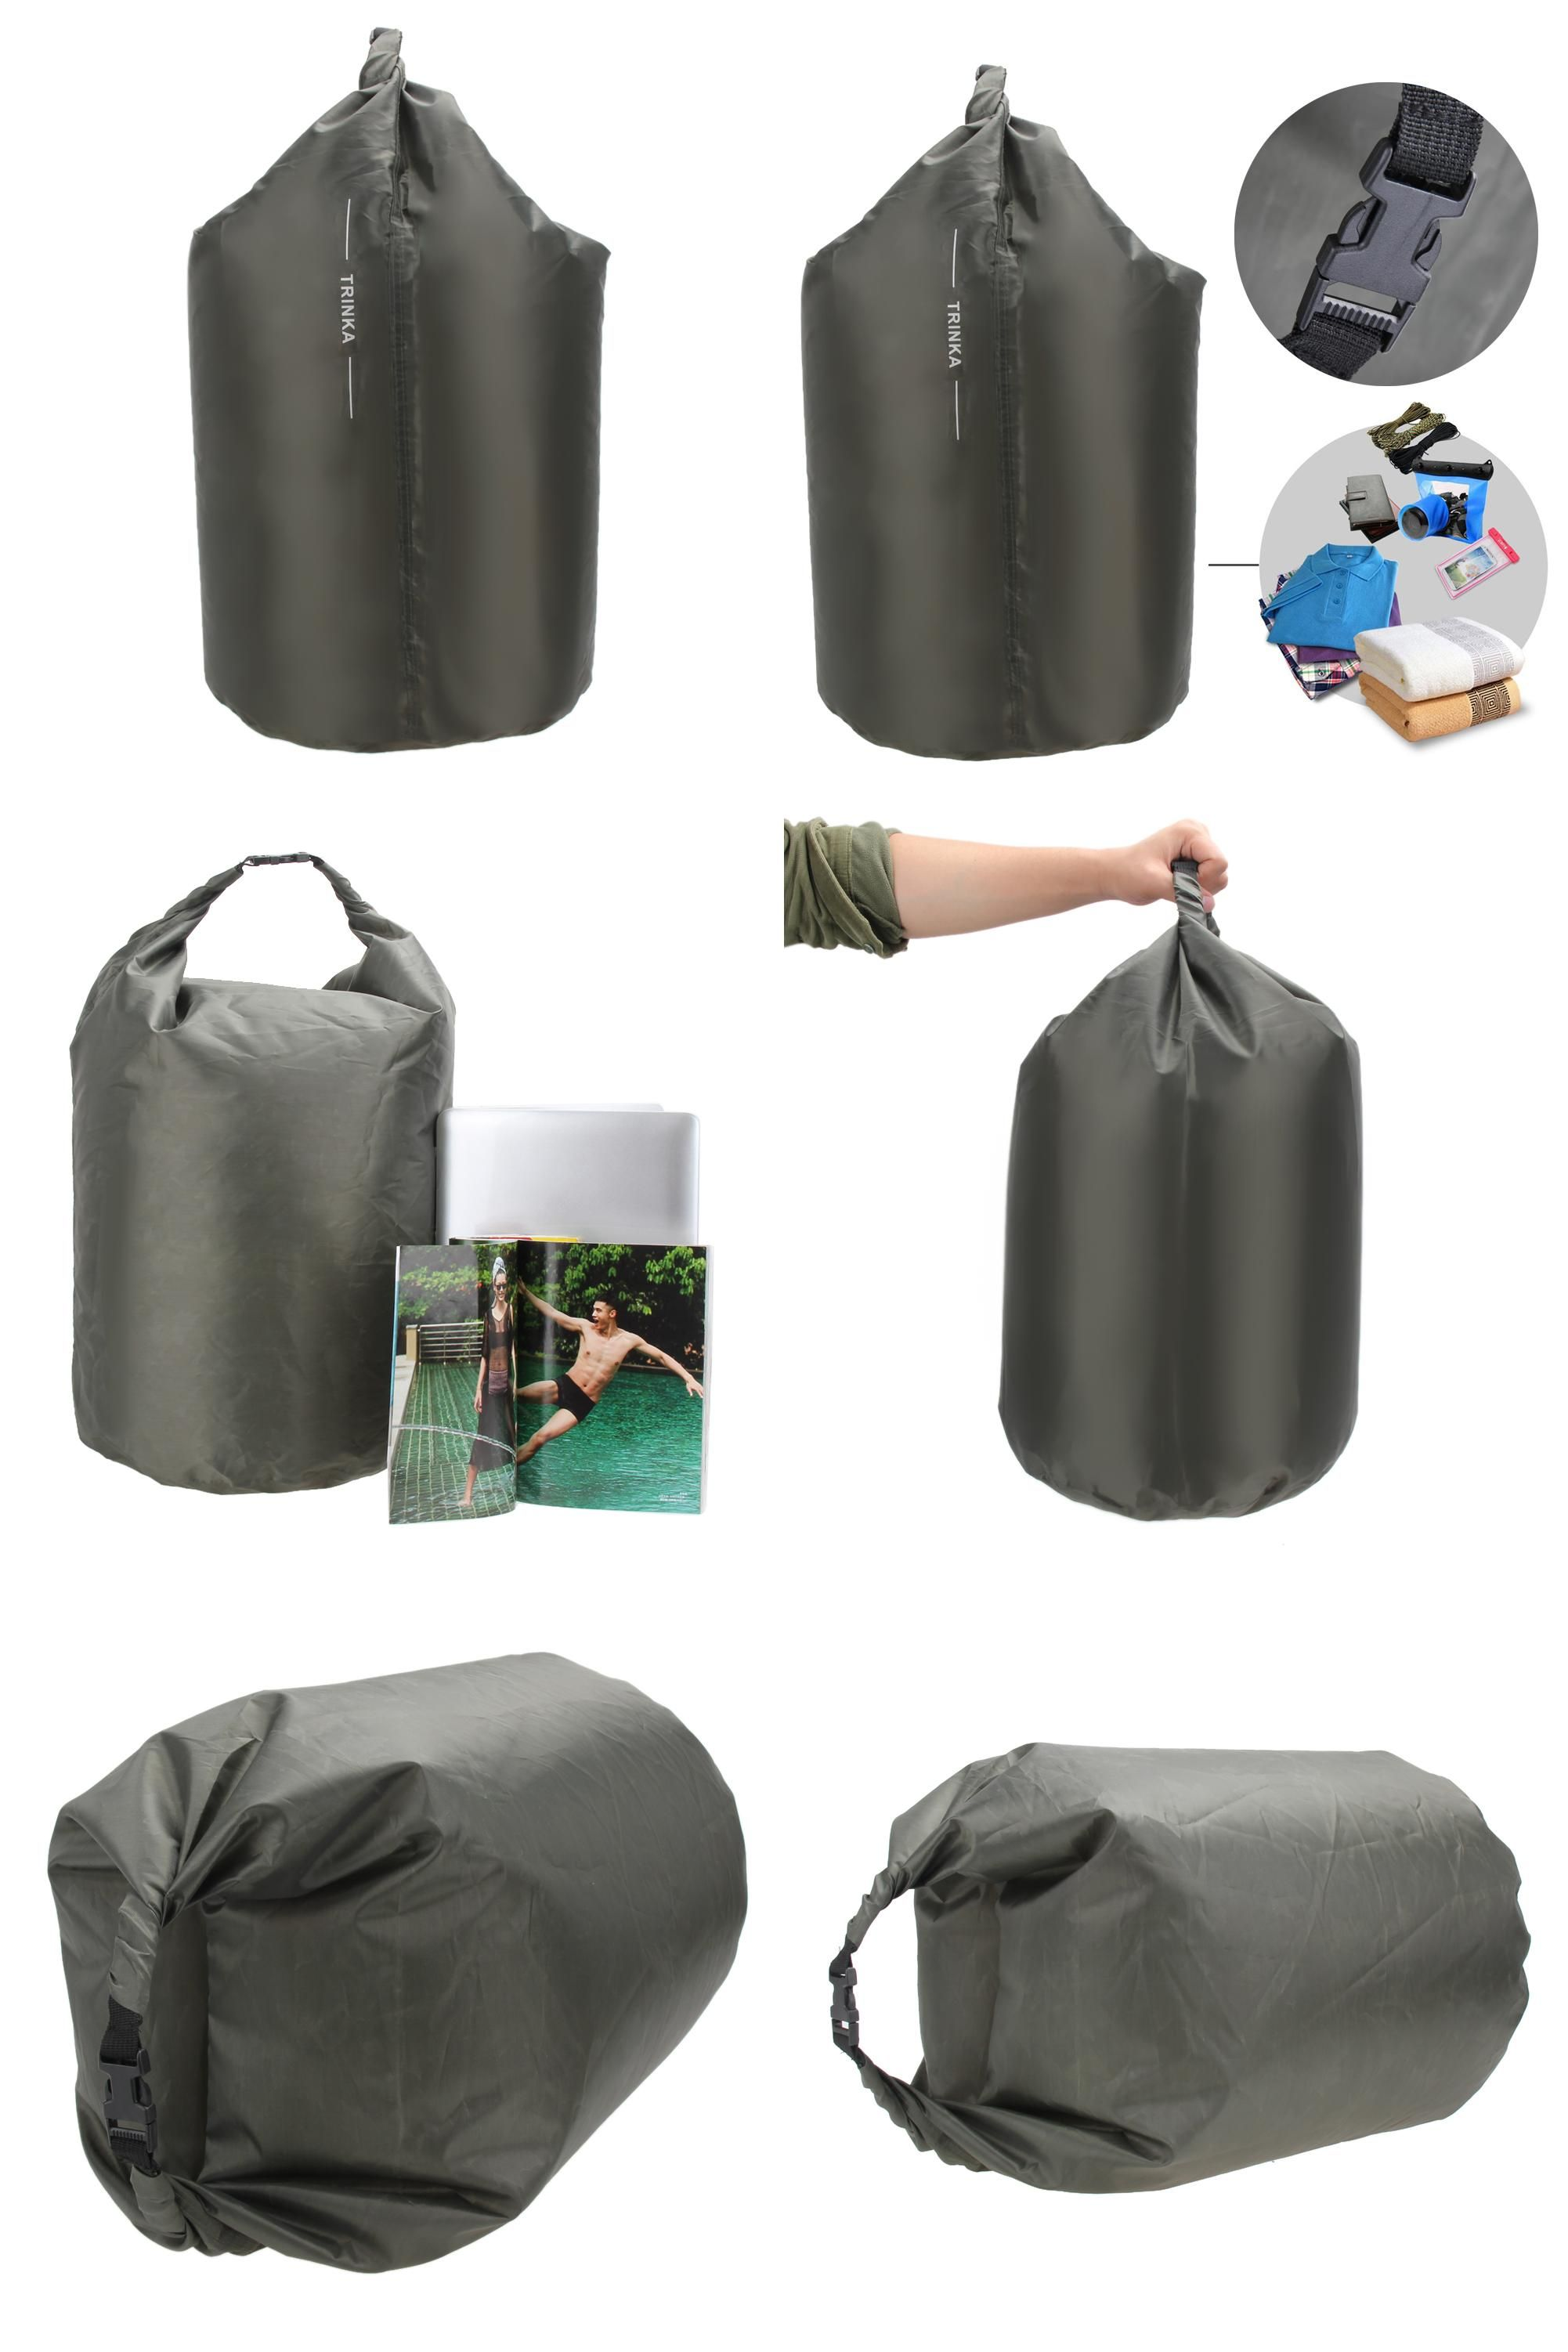 Visit To Buy Waterproof Dry Bag Swiming Bags 40l Dry Storage Bag Water Resistant For Outdoor Kayak Canoe Rafting Upst Waterproof Dry Bag Swimming Bag Dry Bag